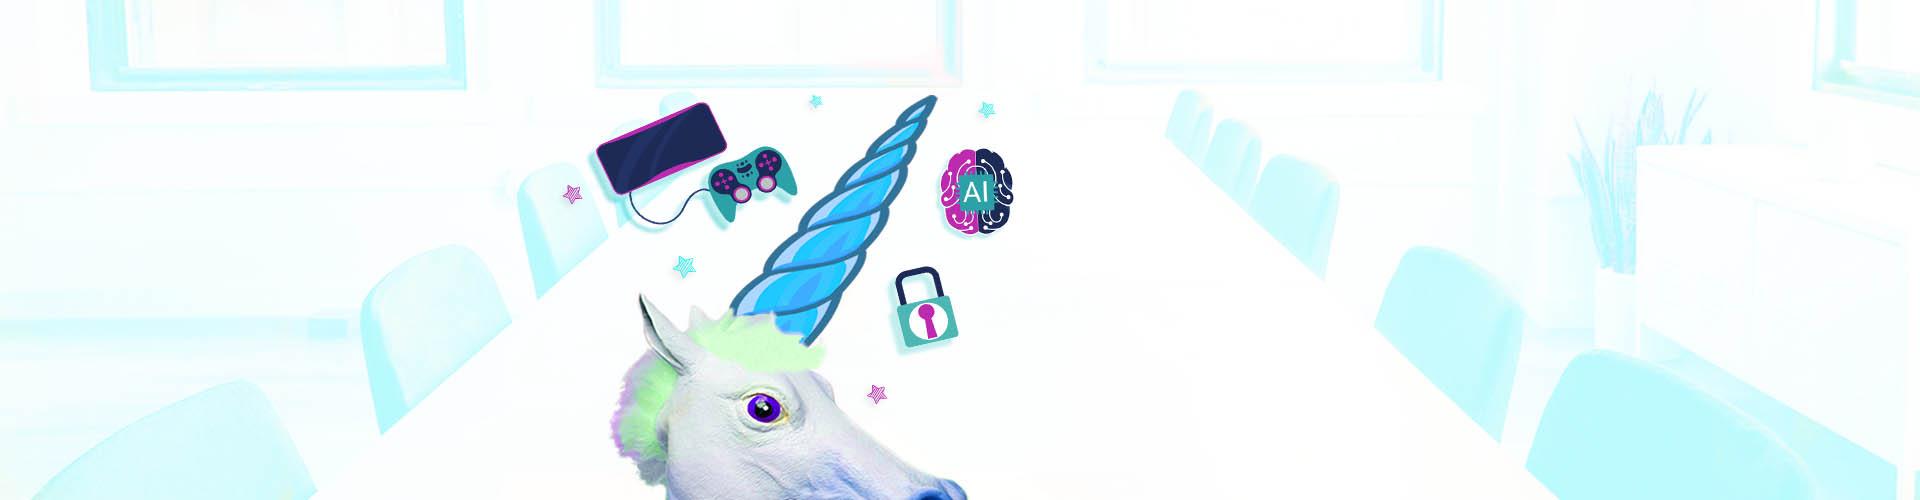 Banner_perfiles_unicornio6